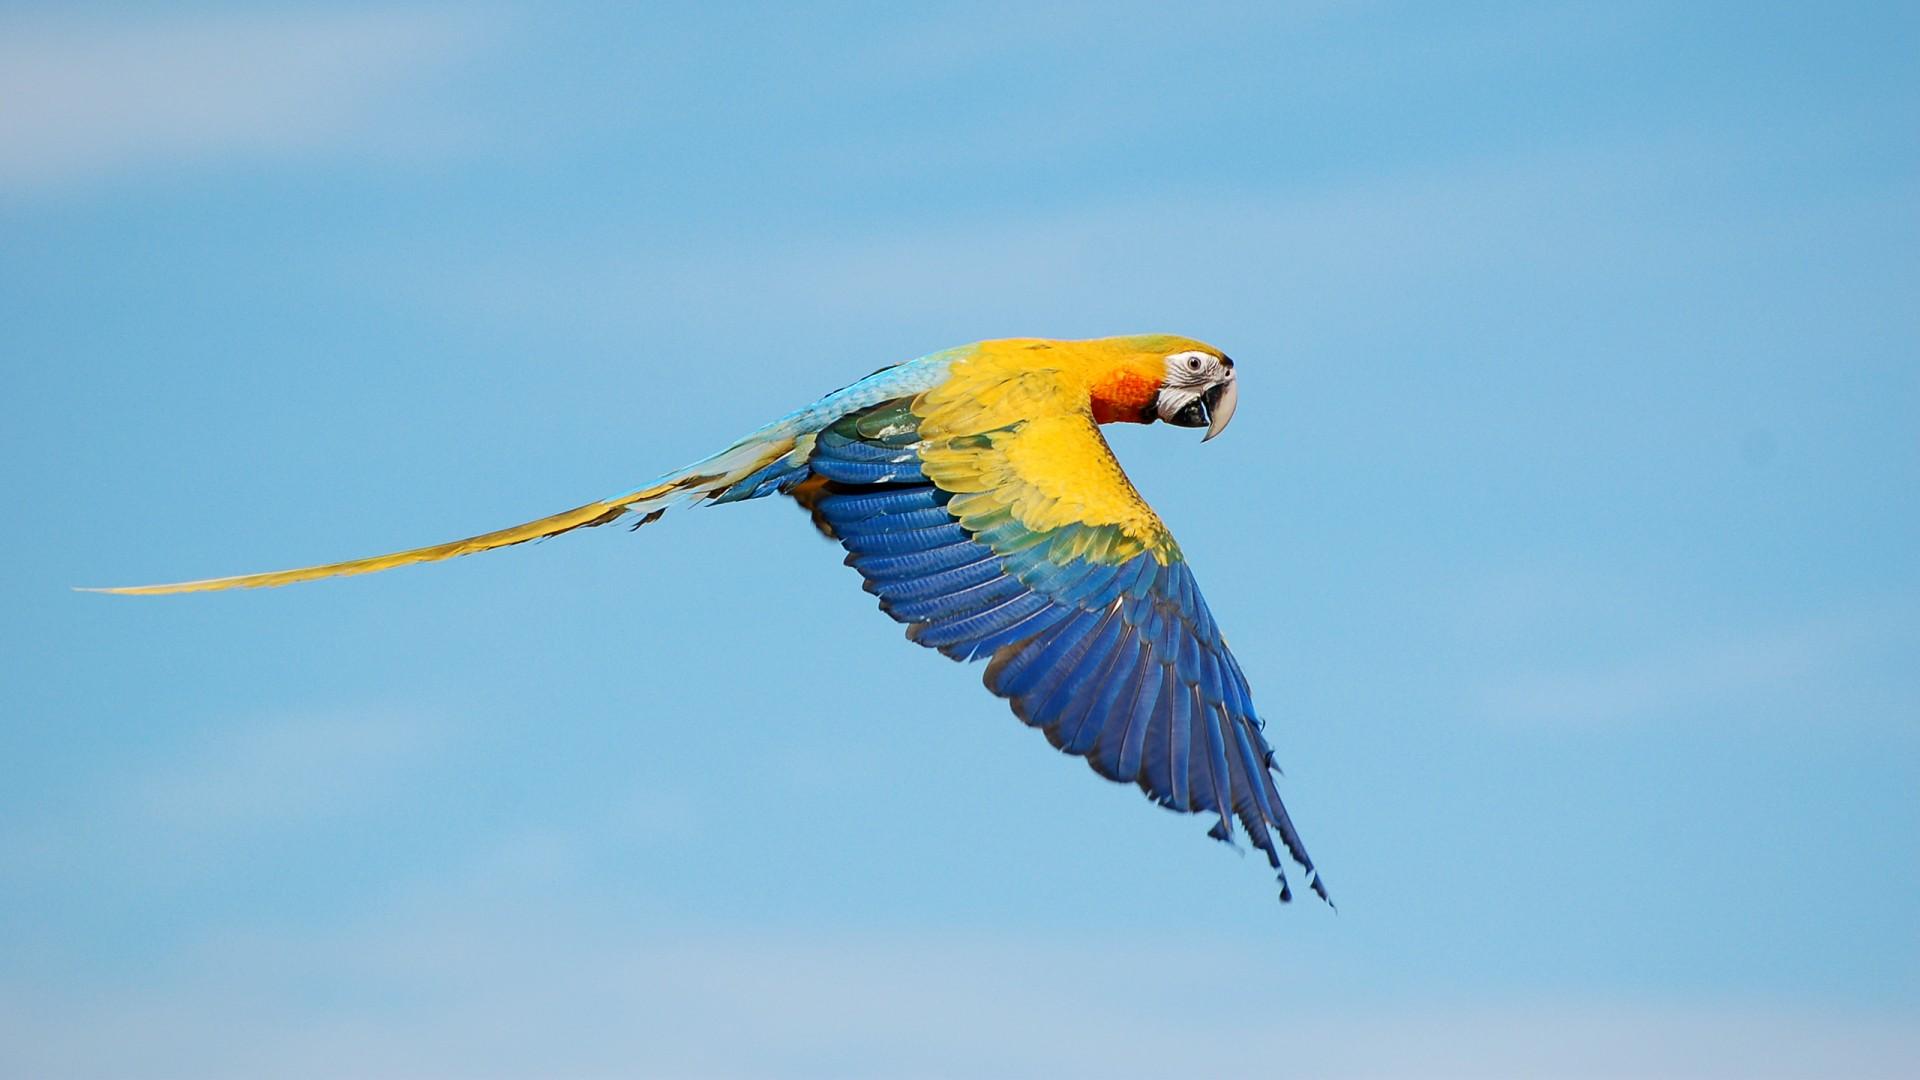 3d Cheetah Wallpaper Flying True Macaws Wallpapers Hd Wallpapers Id 20295